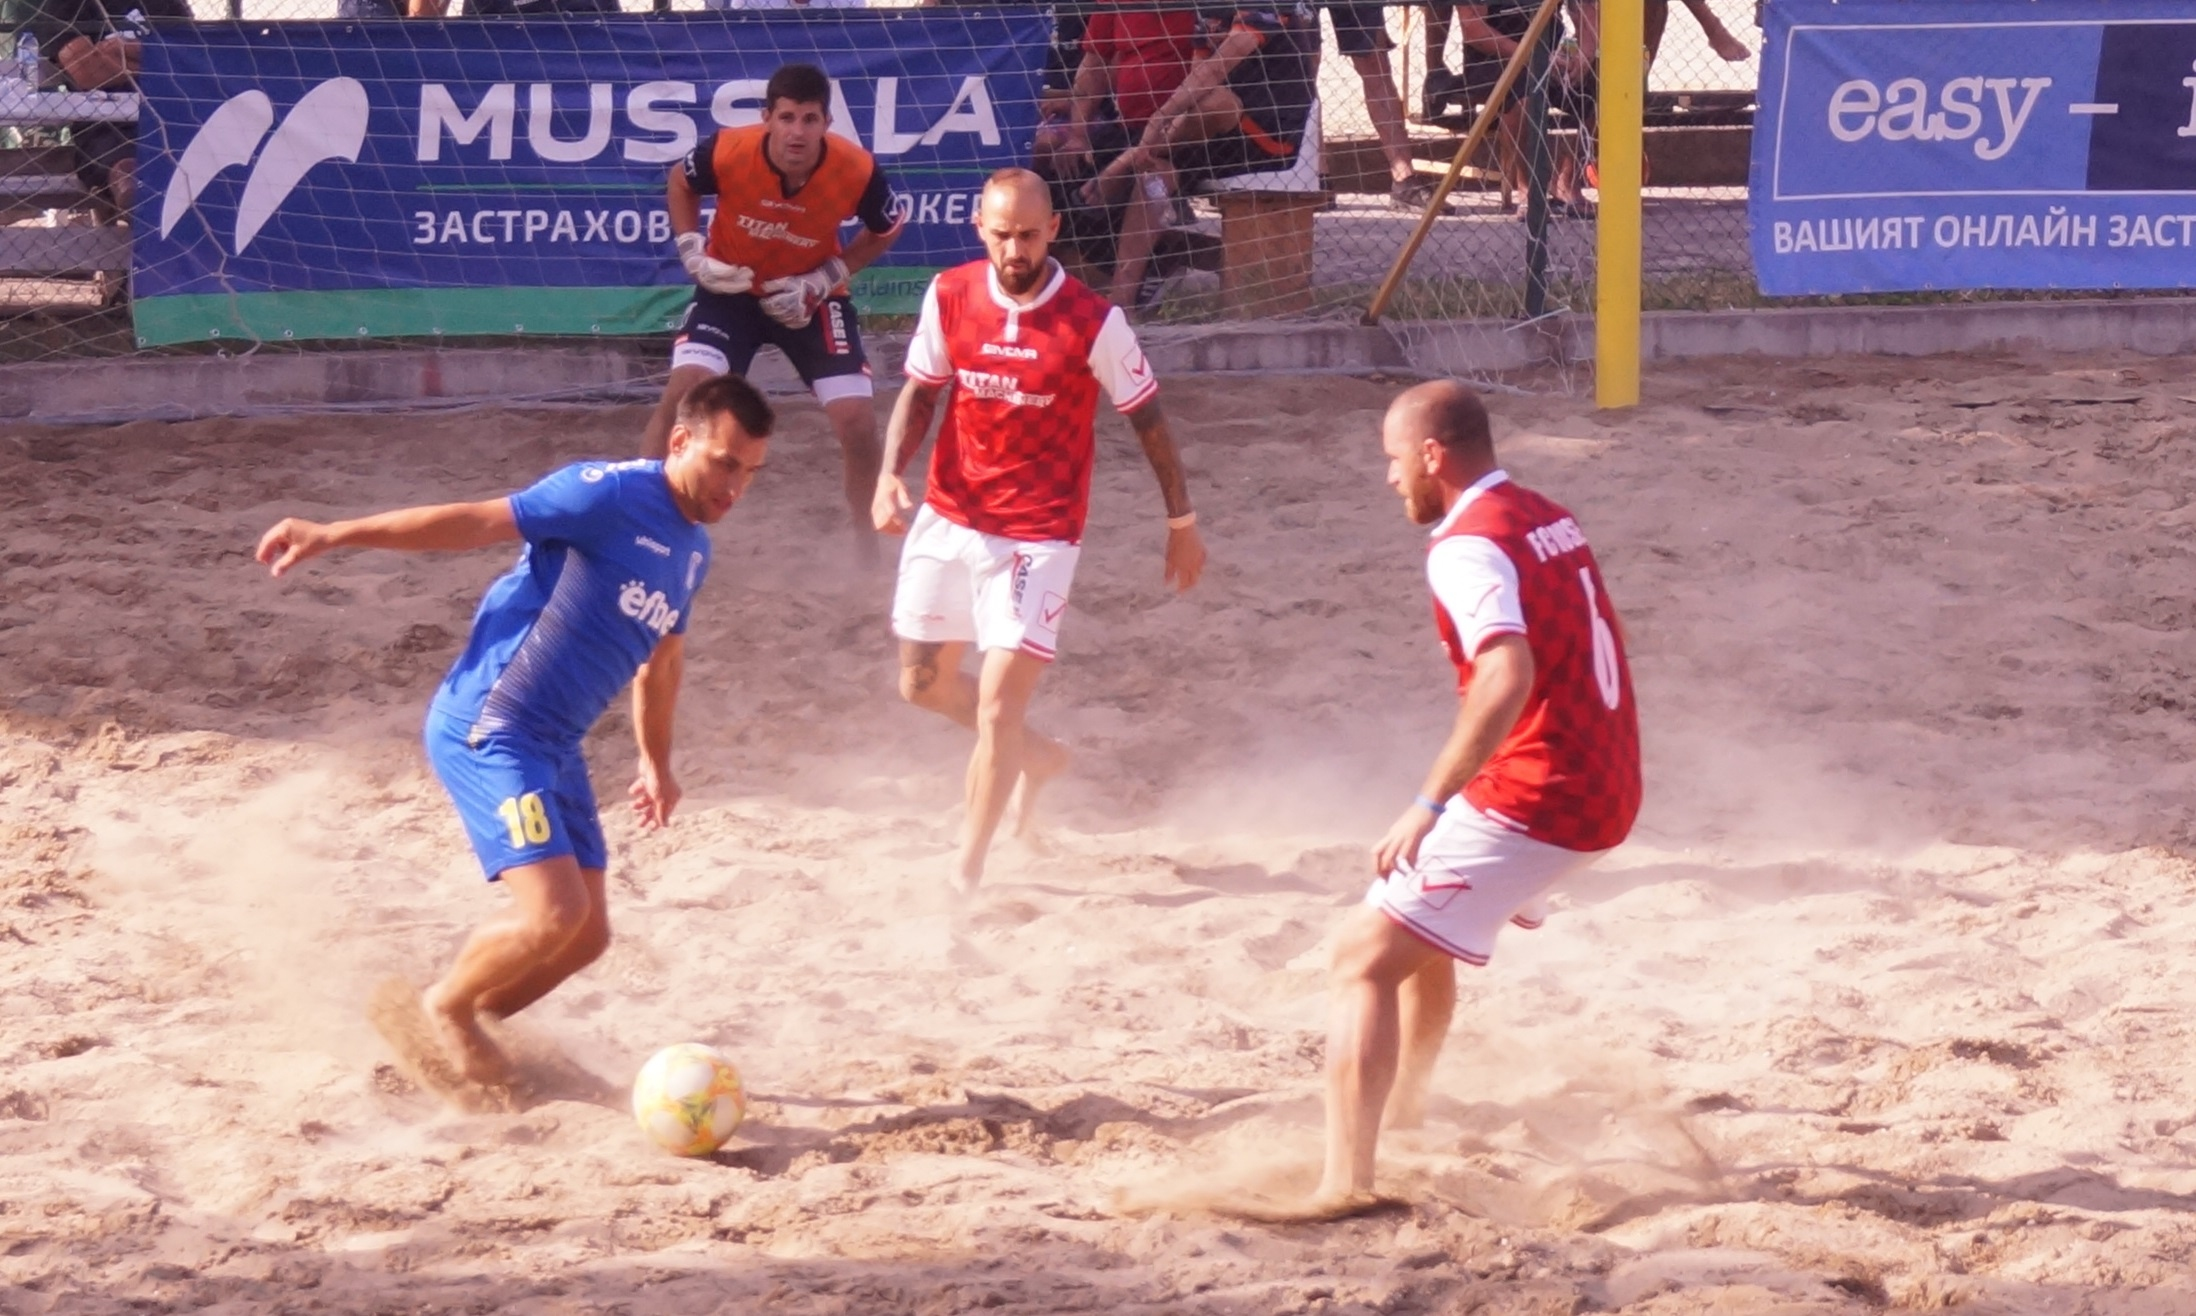 ФК Русе записа втора победа в Mussala Национална лига beach